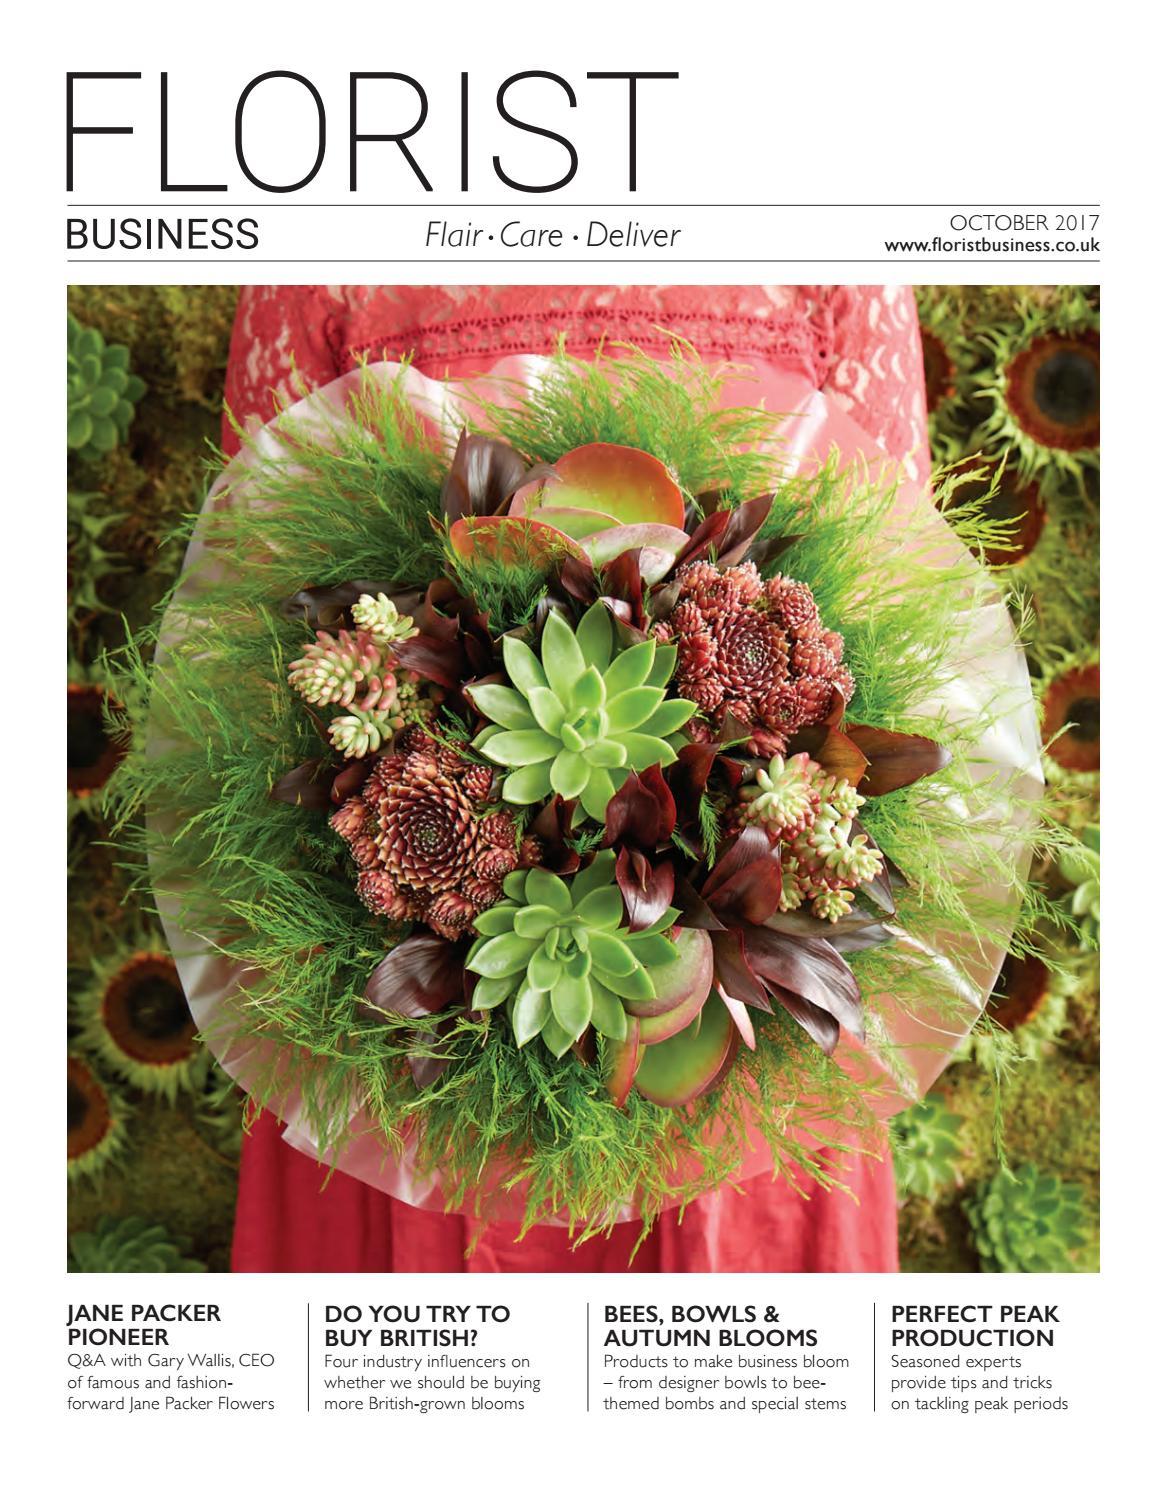 Florist business october 2017 by eljays44 issuu izmirmasajfo